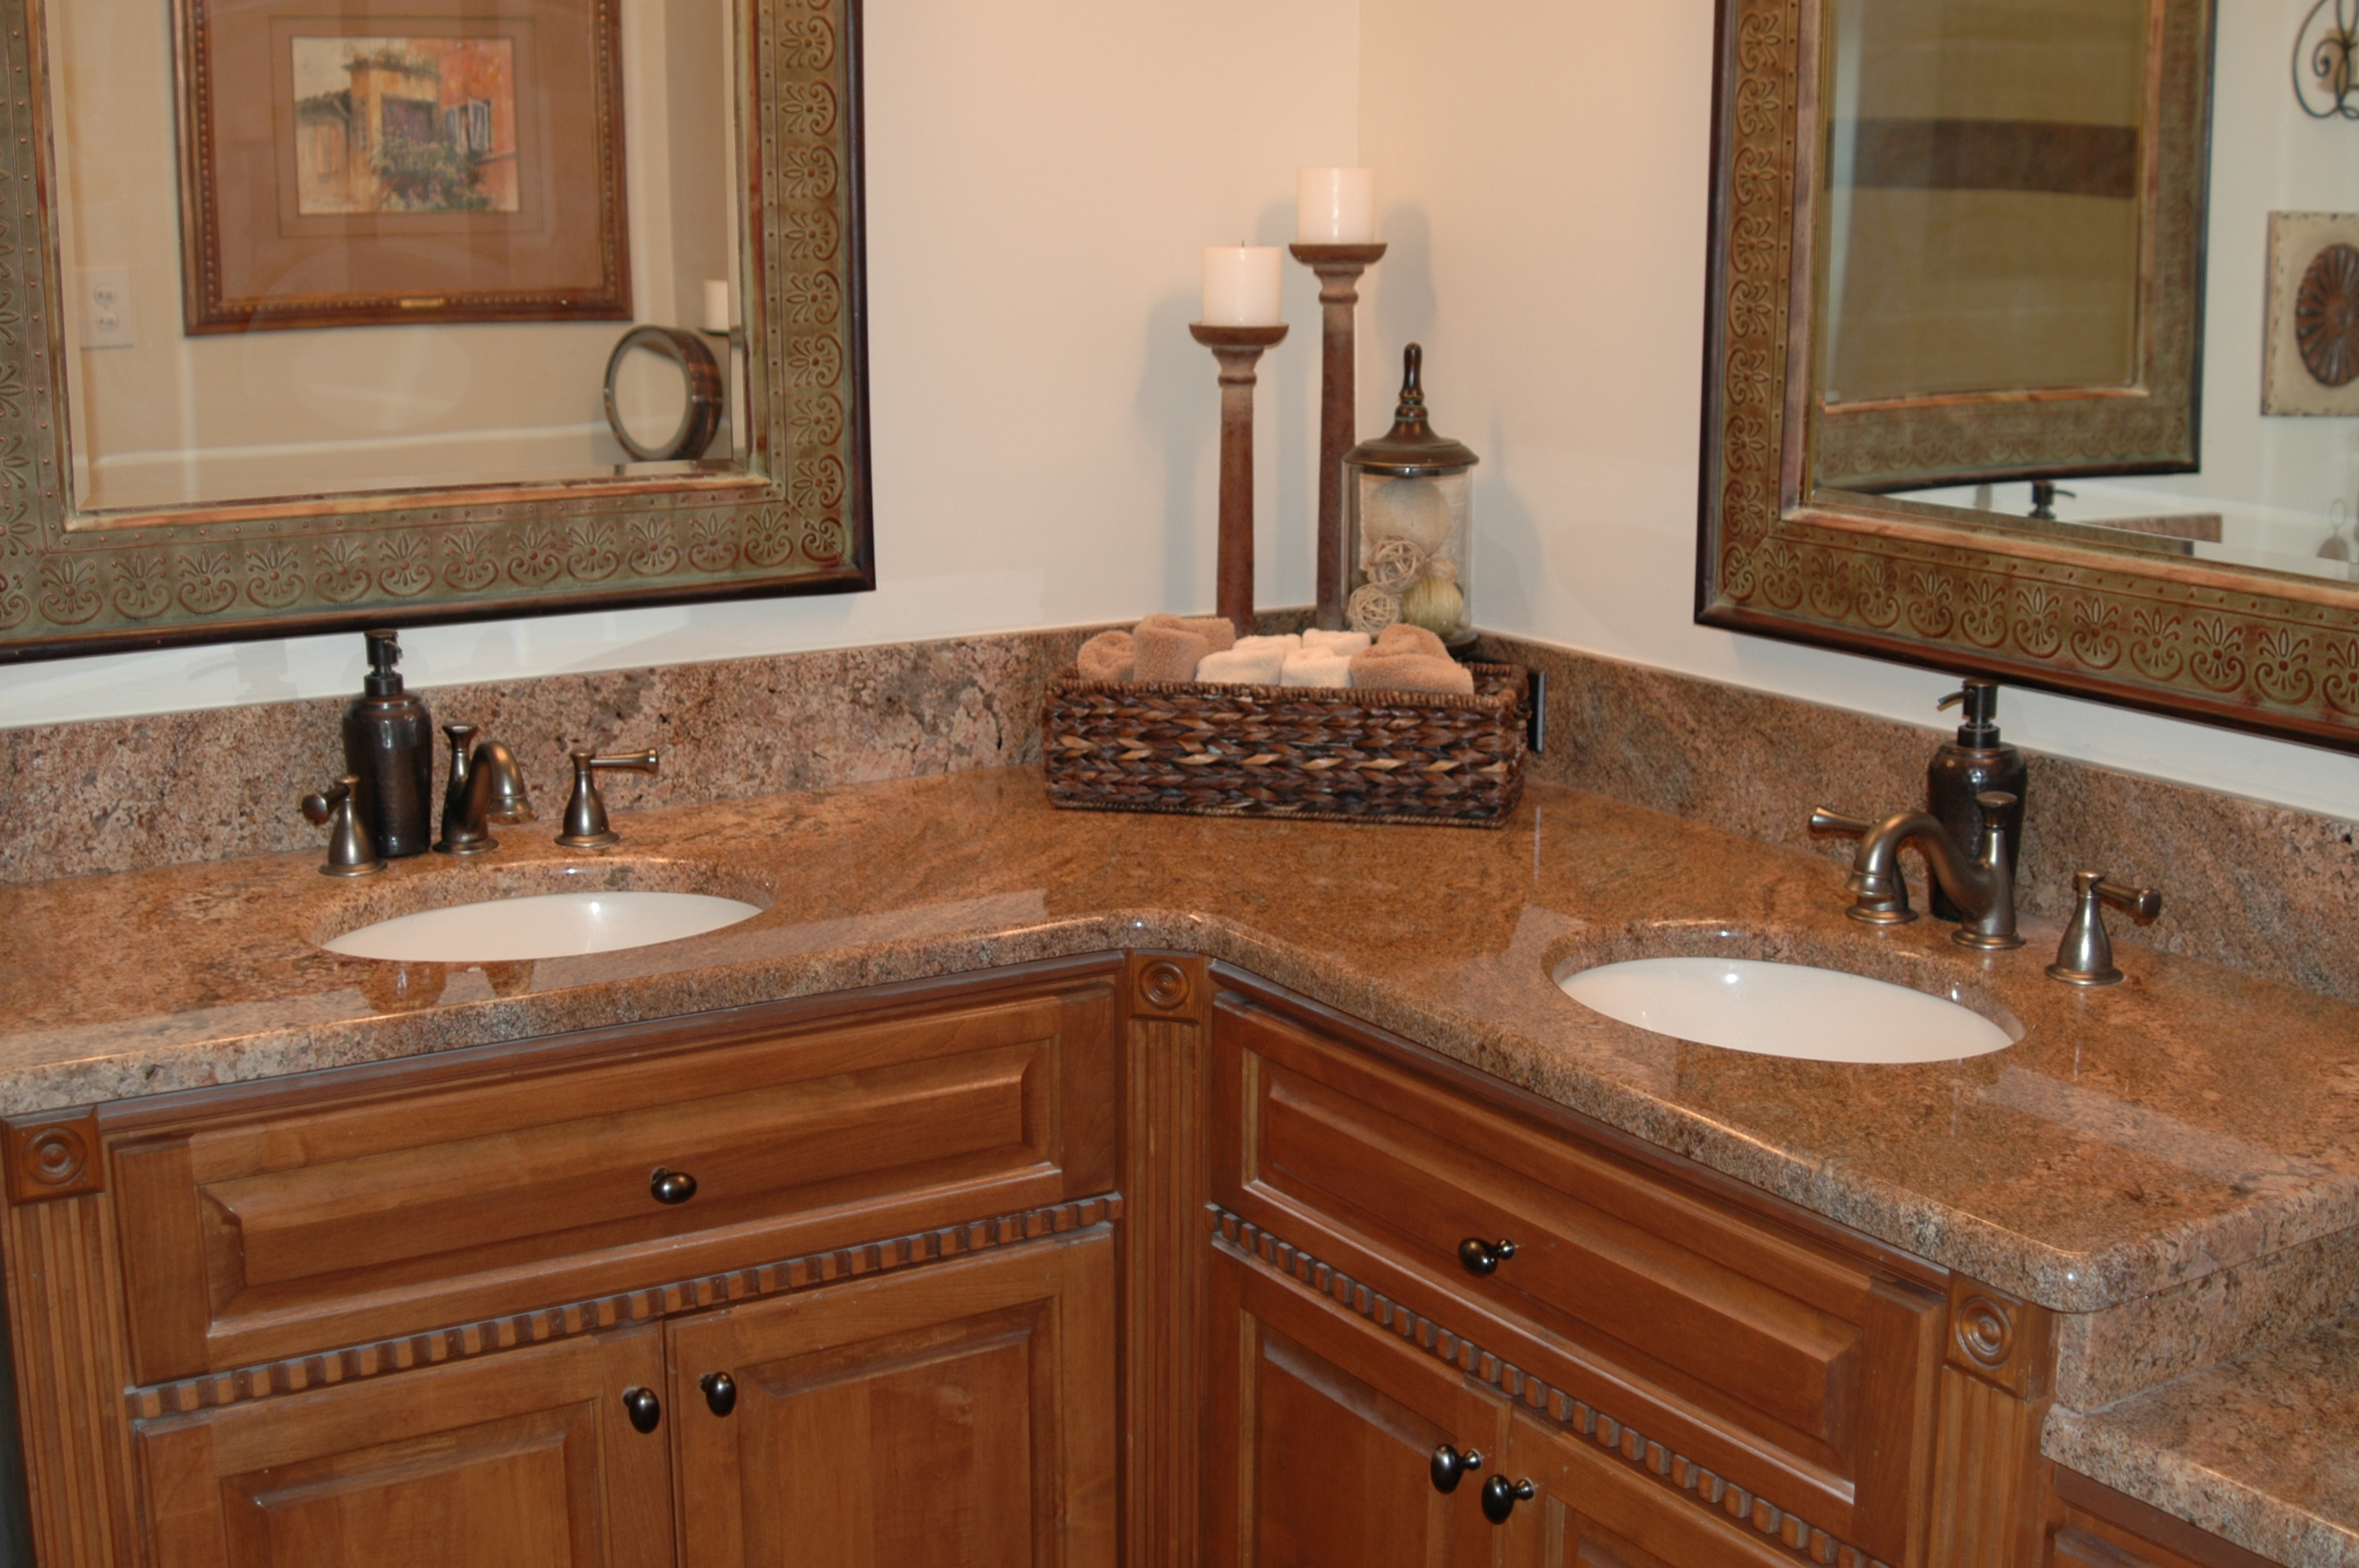 Kitchen Countertop Materials South Africa : ... Quartz Bathroom Countertops in Prattville AL Kitchen Creations Inc